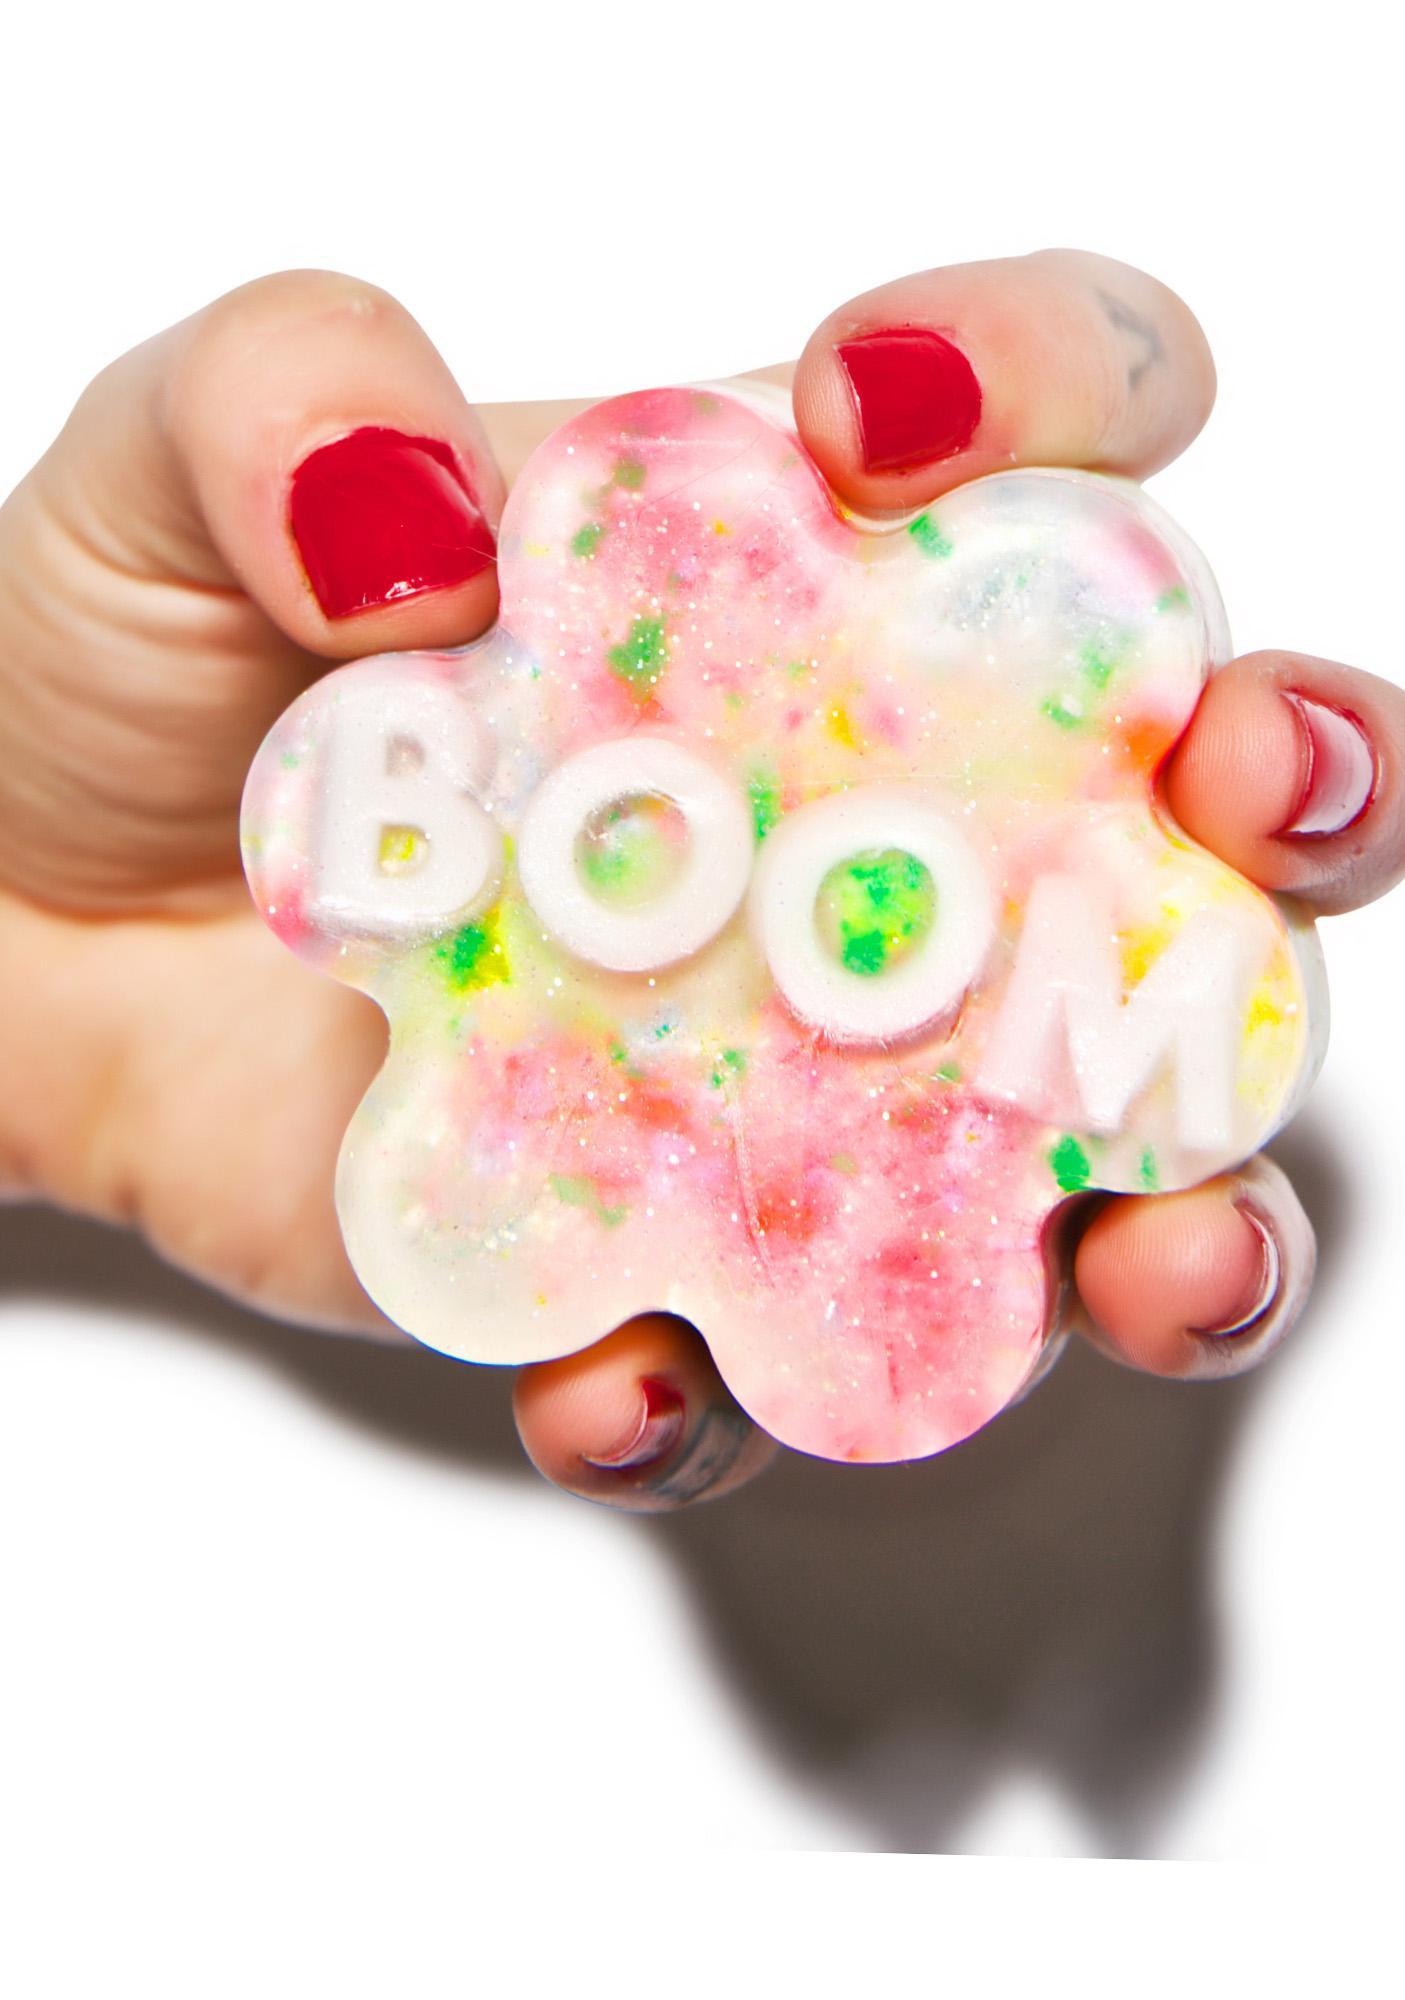 Dirty Grl X Chloe Norgaard Wild Flower Boom Soap